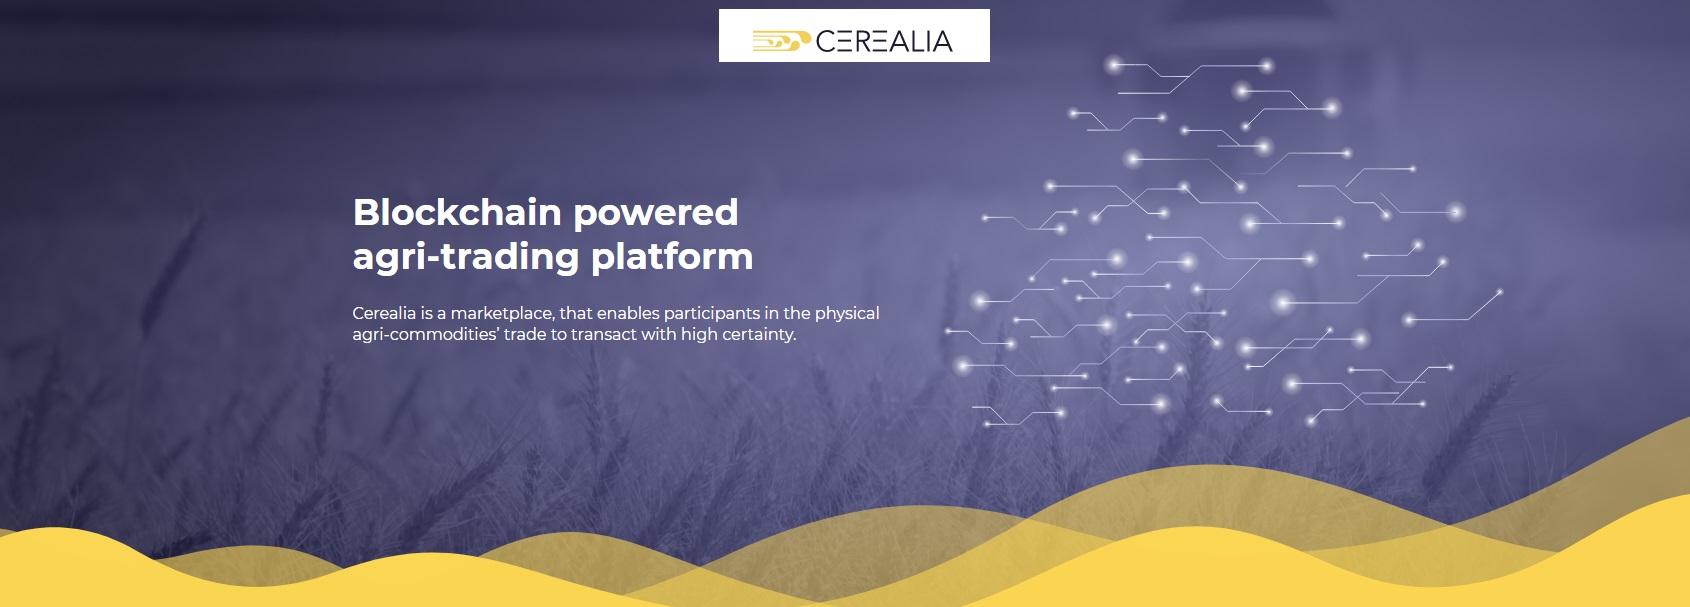 Cerealia updated